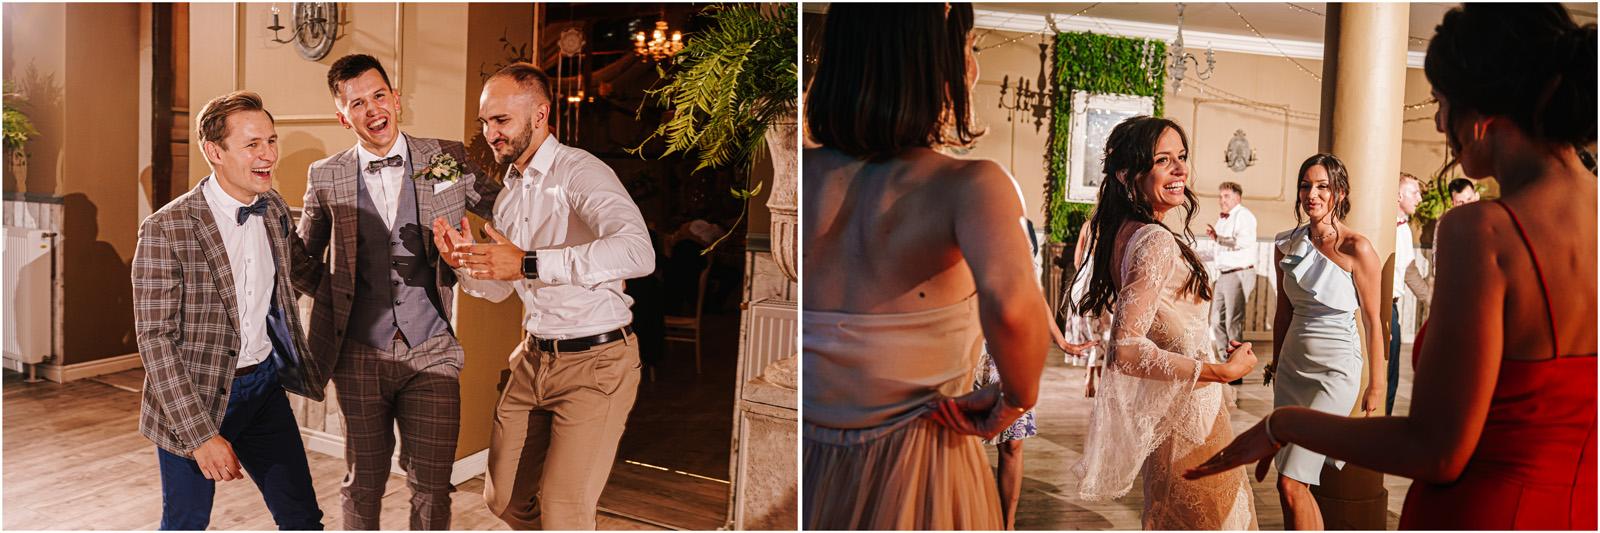 Ania & Mateusz | boho wesele w Stodole pod Kasztanami 108